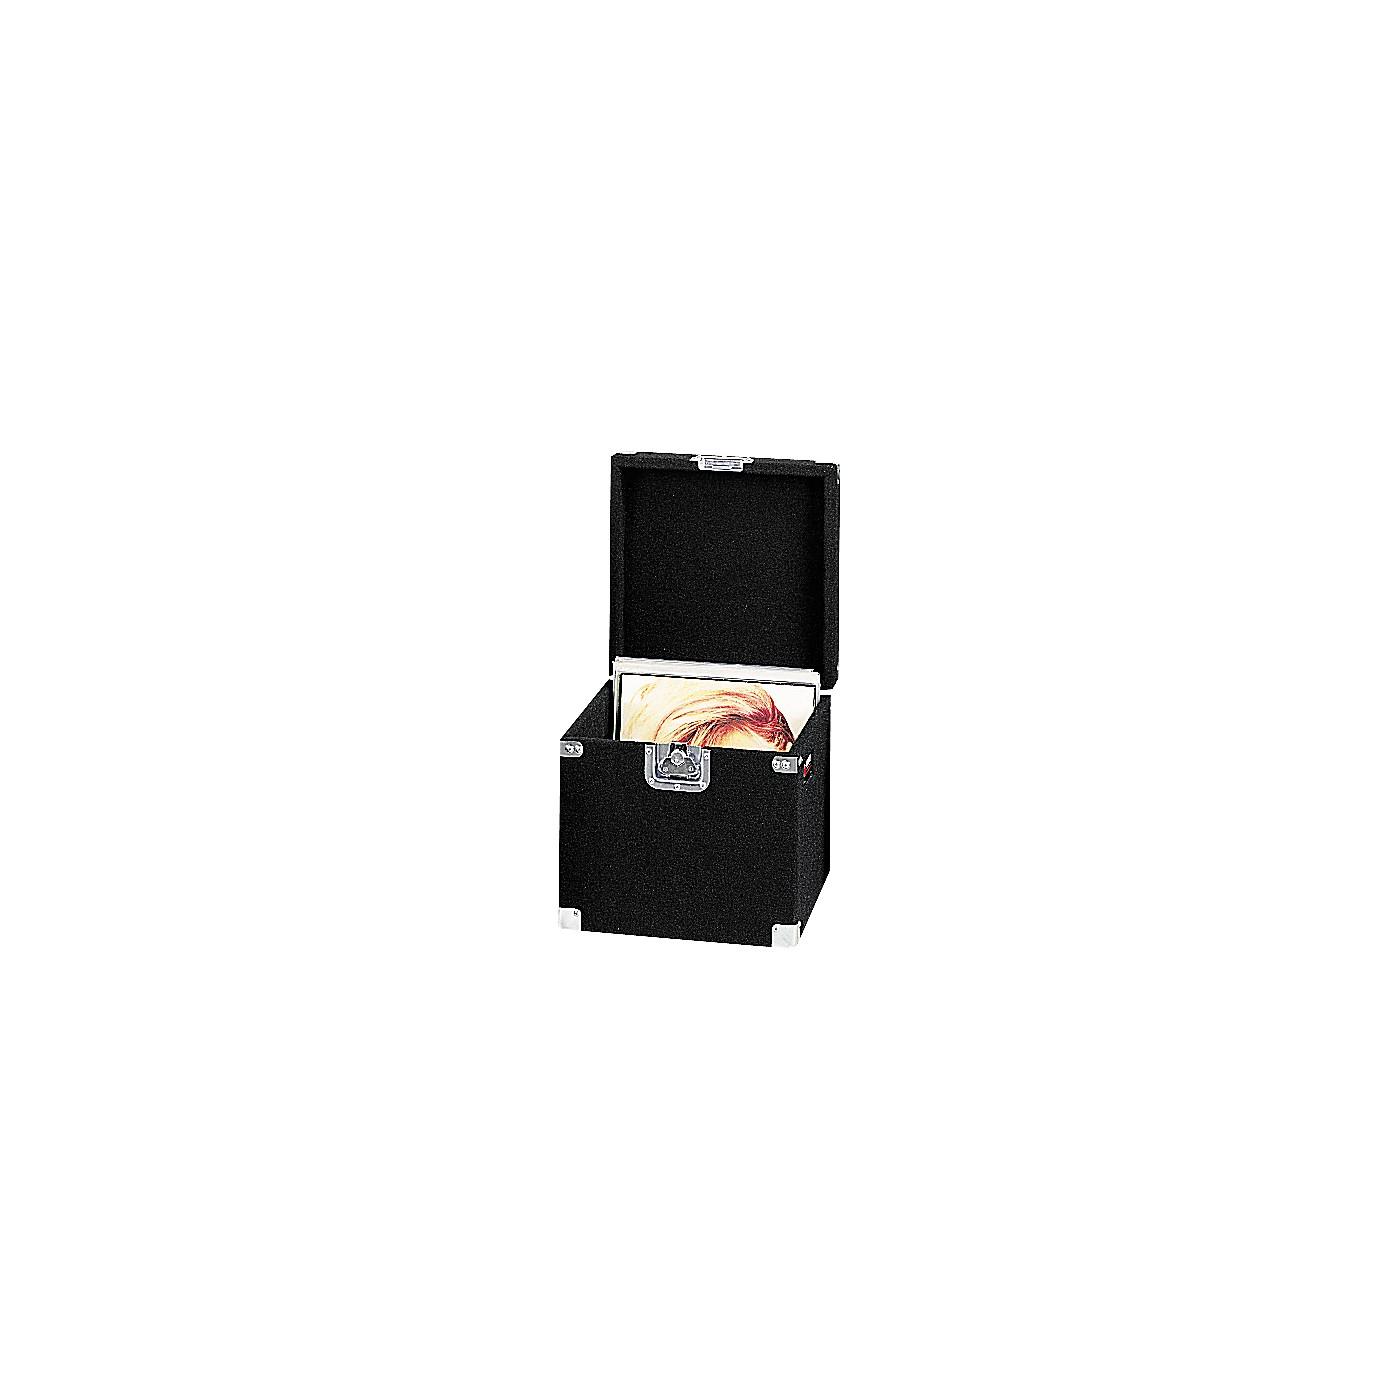 Odyssey Carpeted Pro 100 LP Case thumbnail